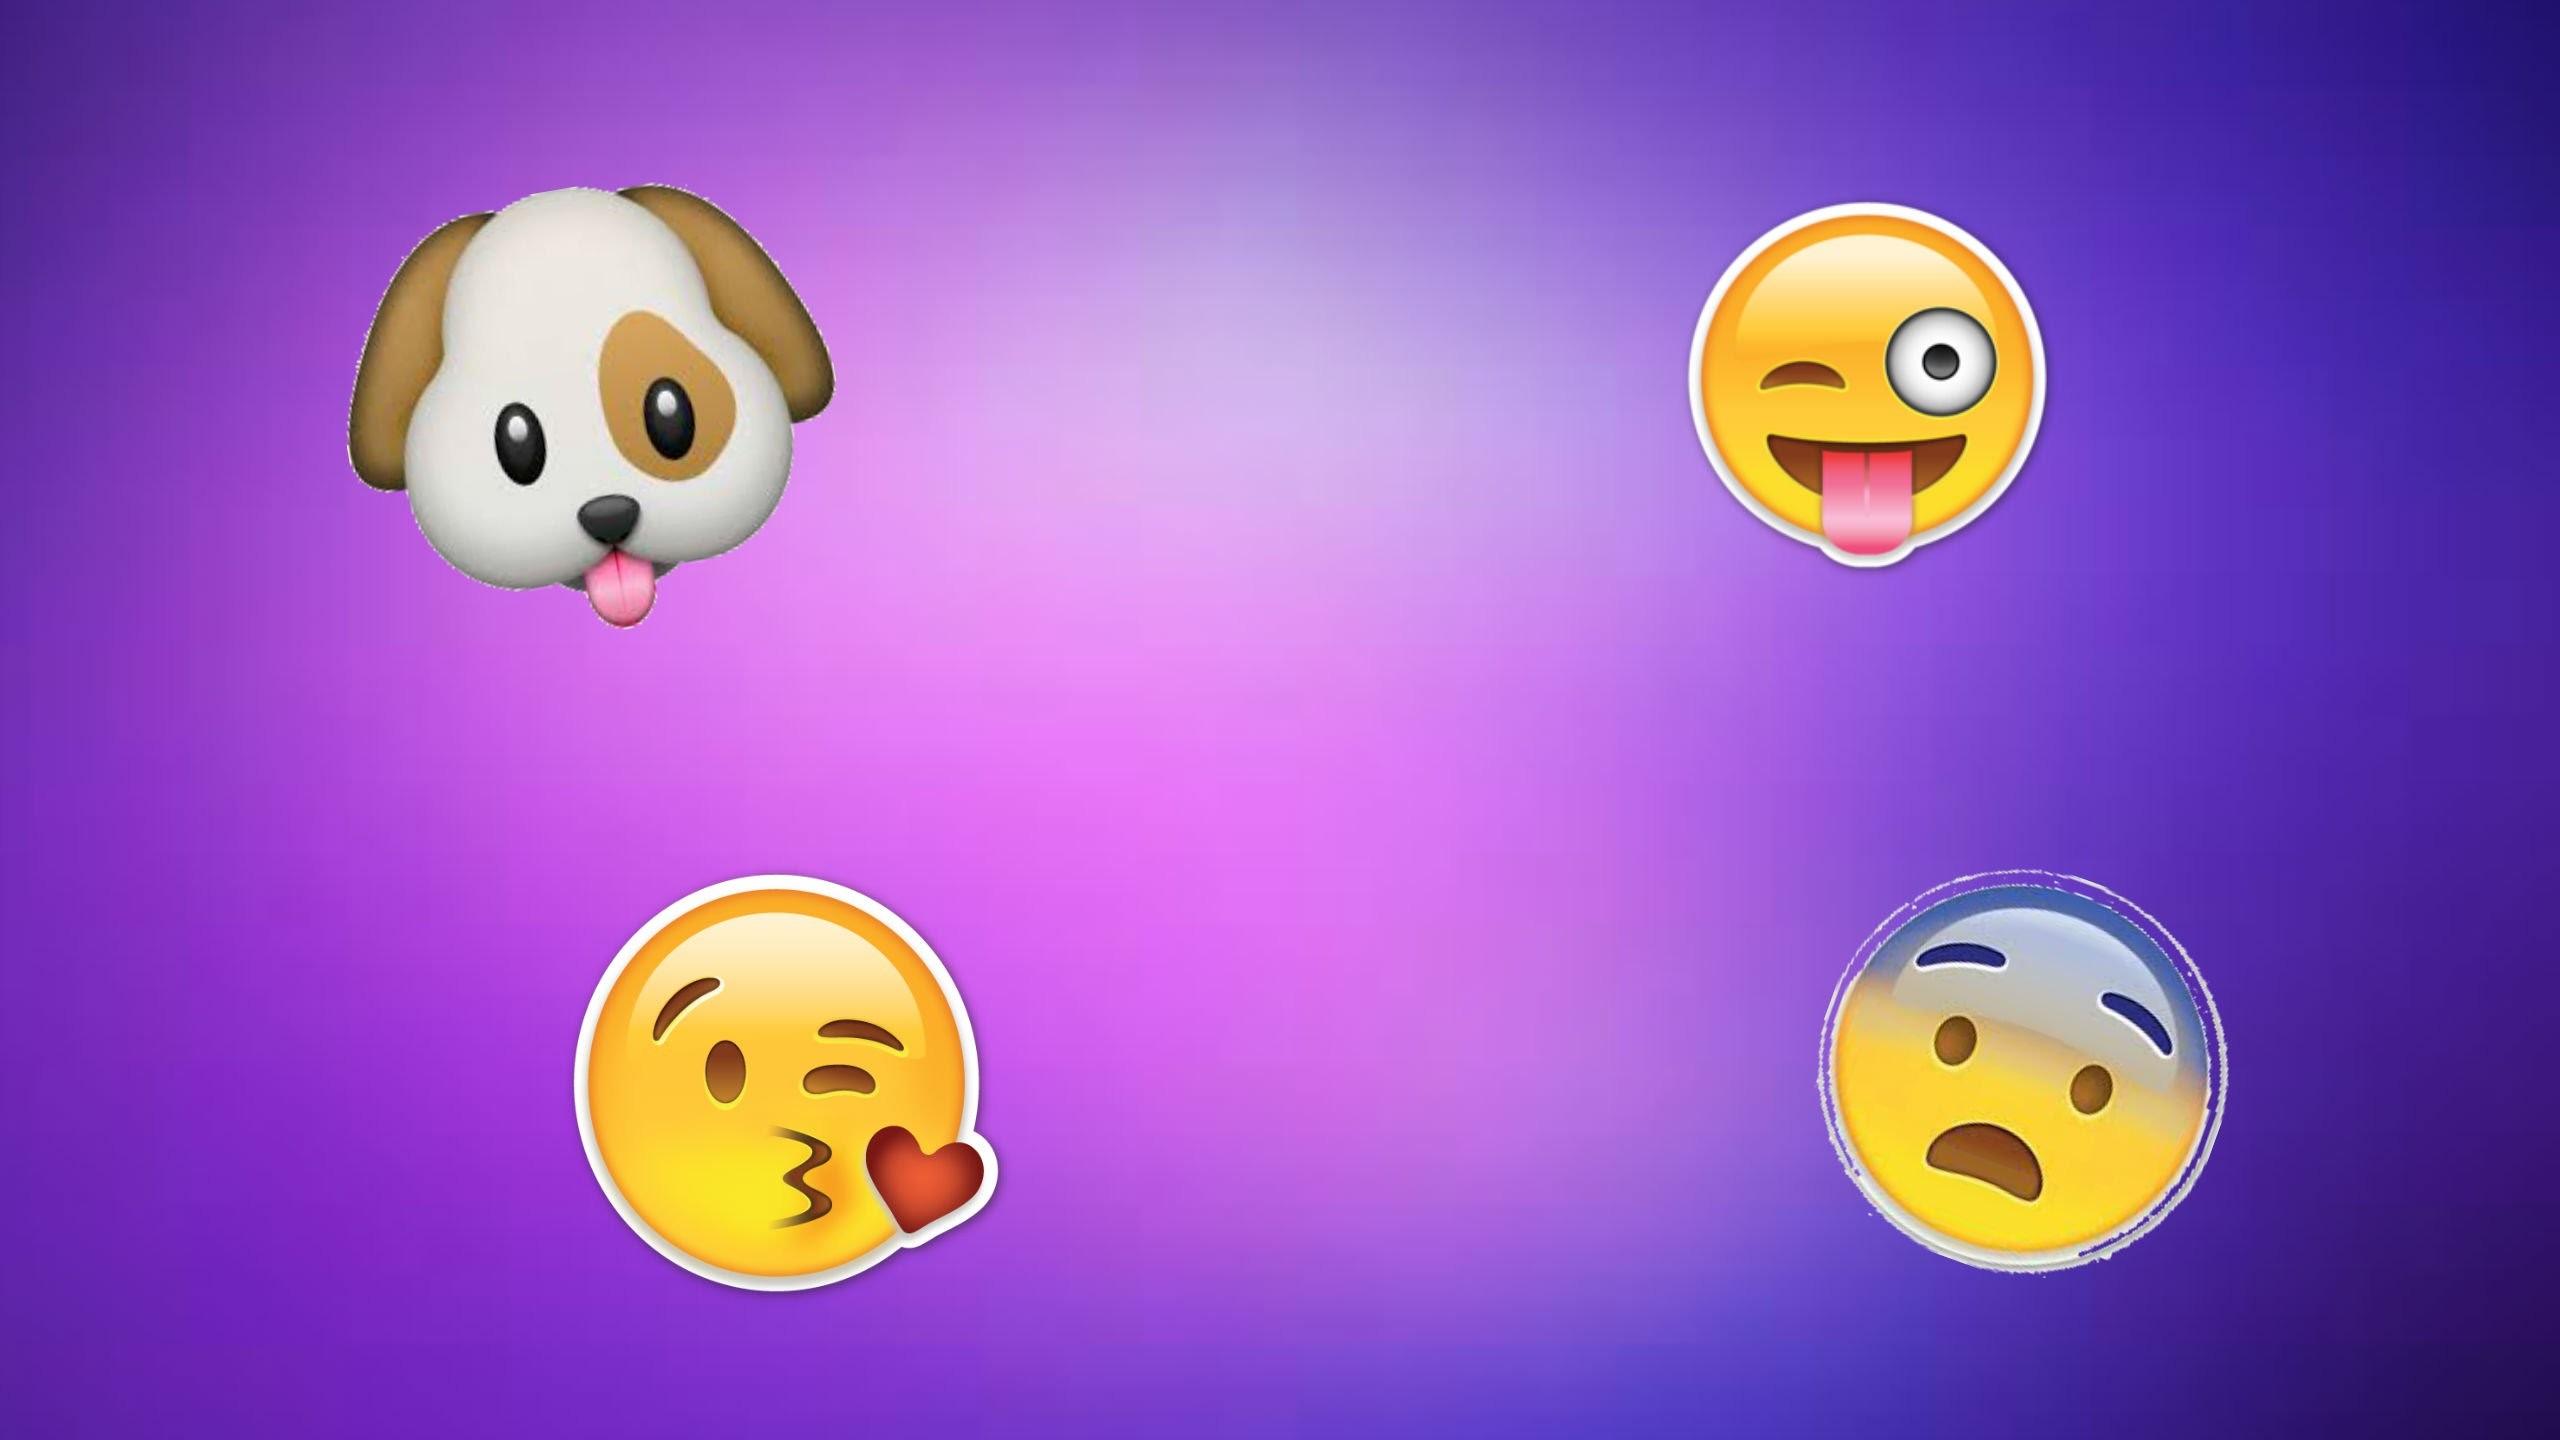 Rilakkuma Wallpaper Iphone 4 Monkey Emoji Wallpaper 46 Images